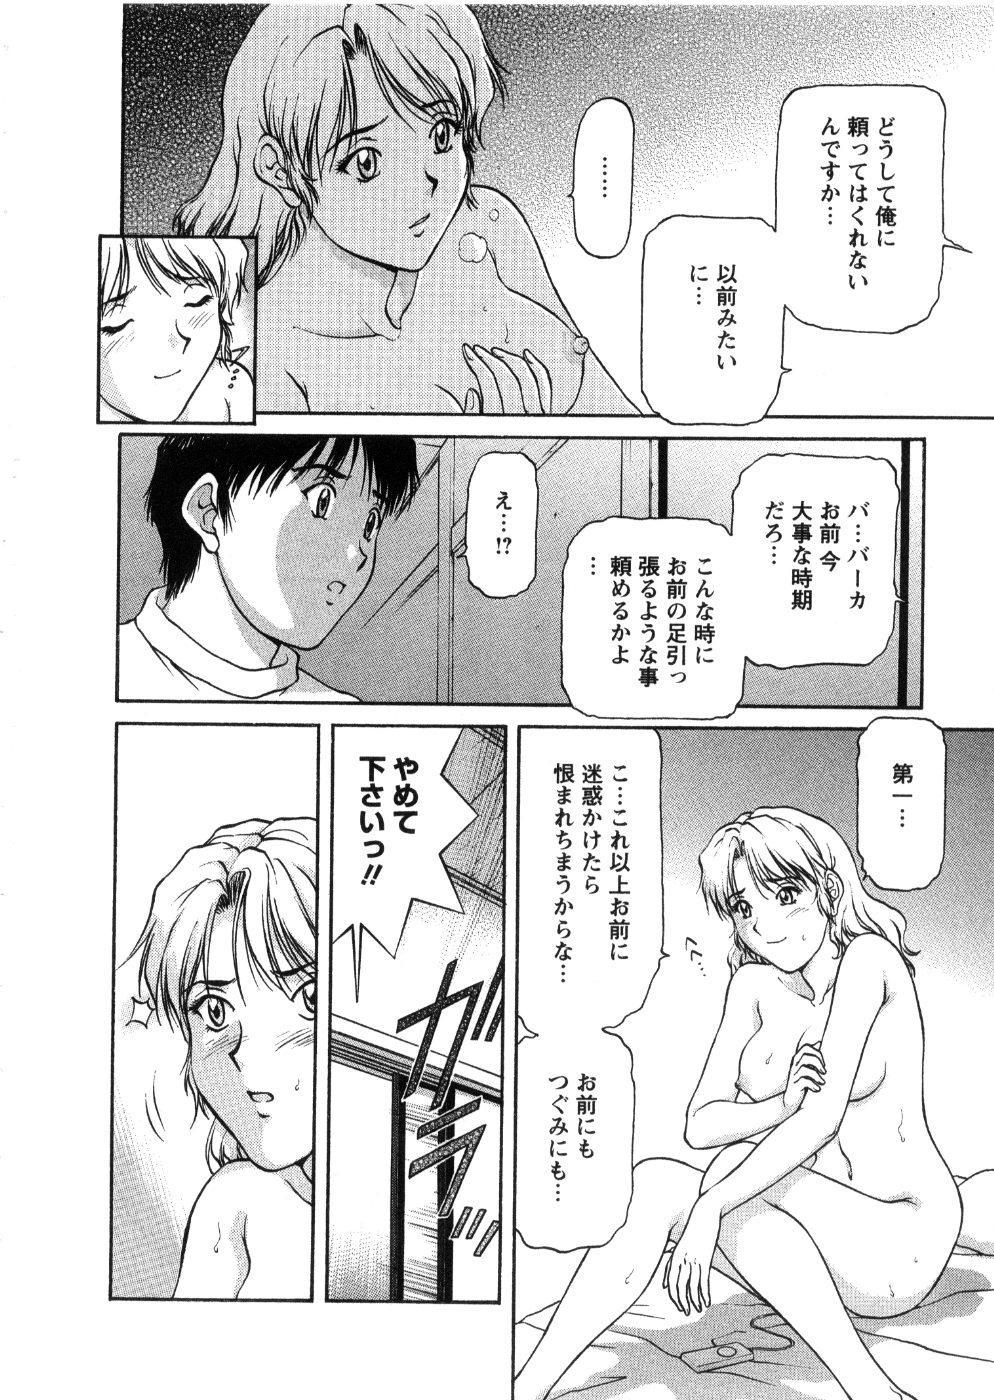 Oneechan-tachi ga Yatte Kuru 03 101